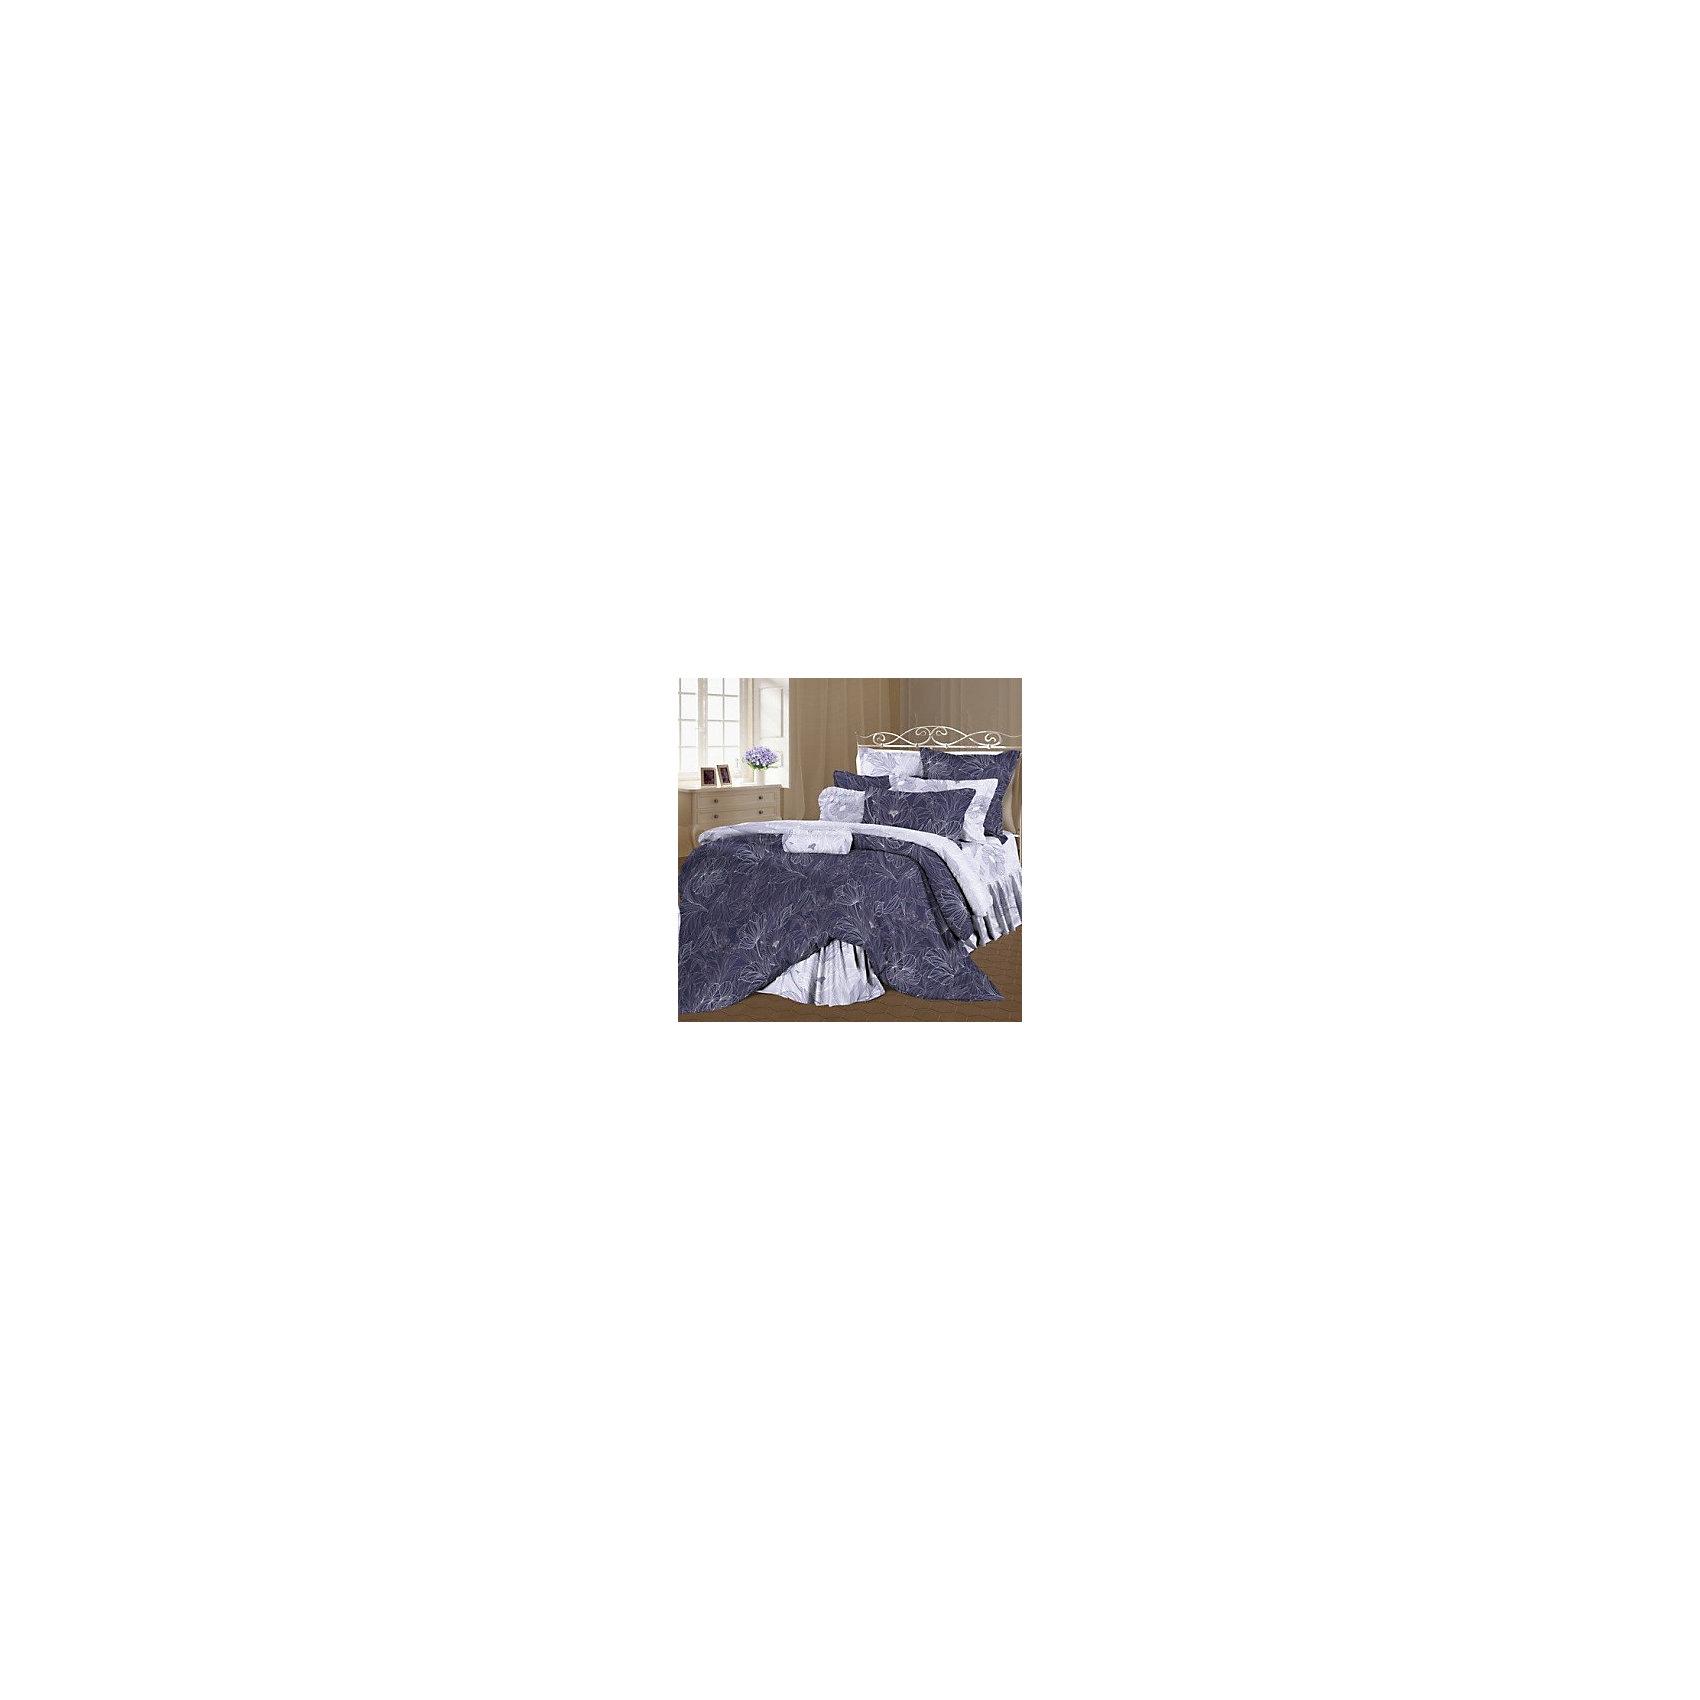 Романтика Постельное белье 1,5 Консуэло перкаль, Романтика романтика романтика кпб махараджа 1 5 спал